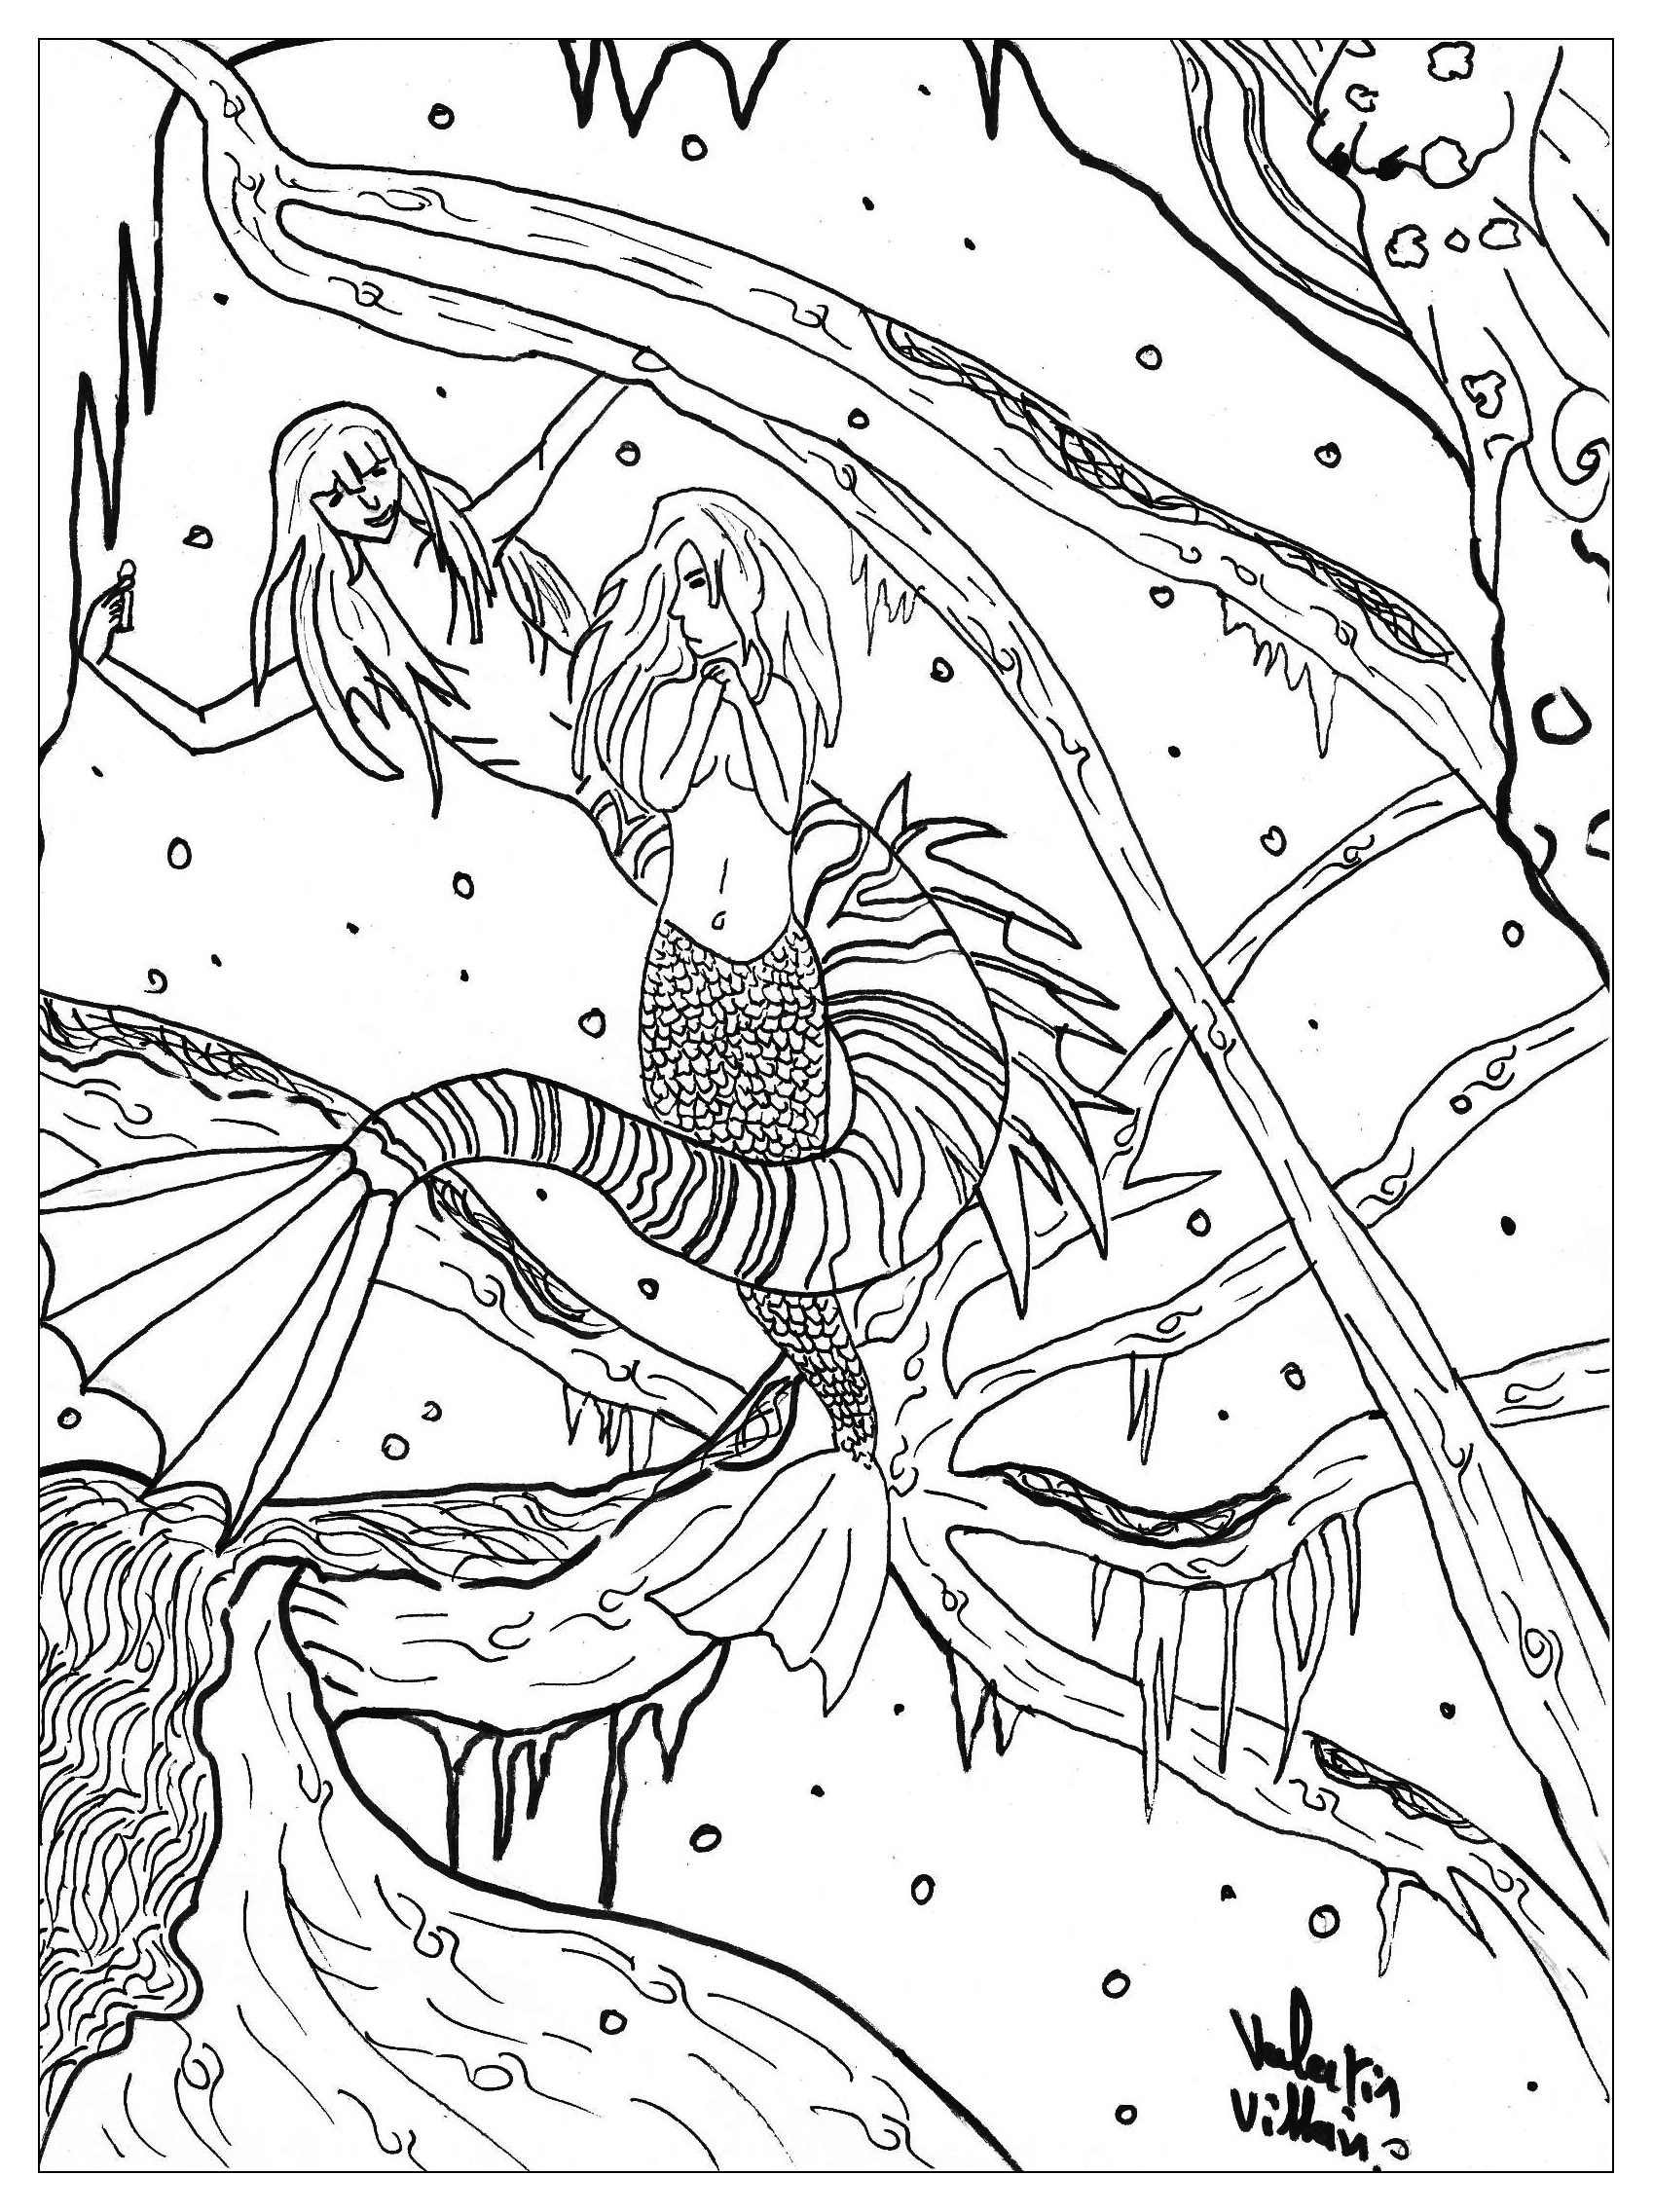 Little Mermaid - Fairy Tales Adult Coloring Pages - Free Printable Coloring Pages Fairies Adults